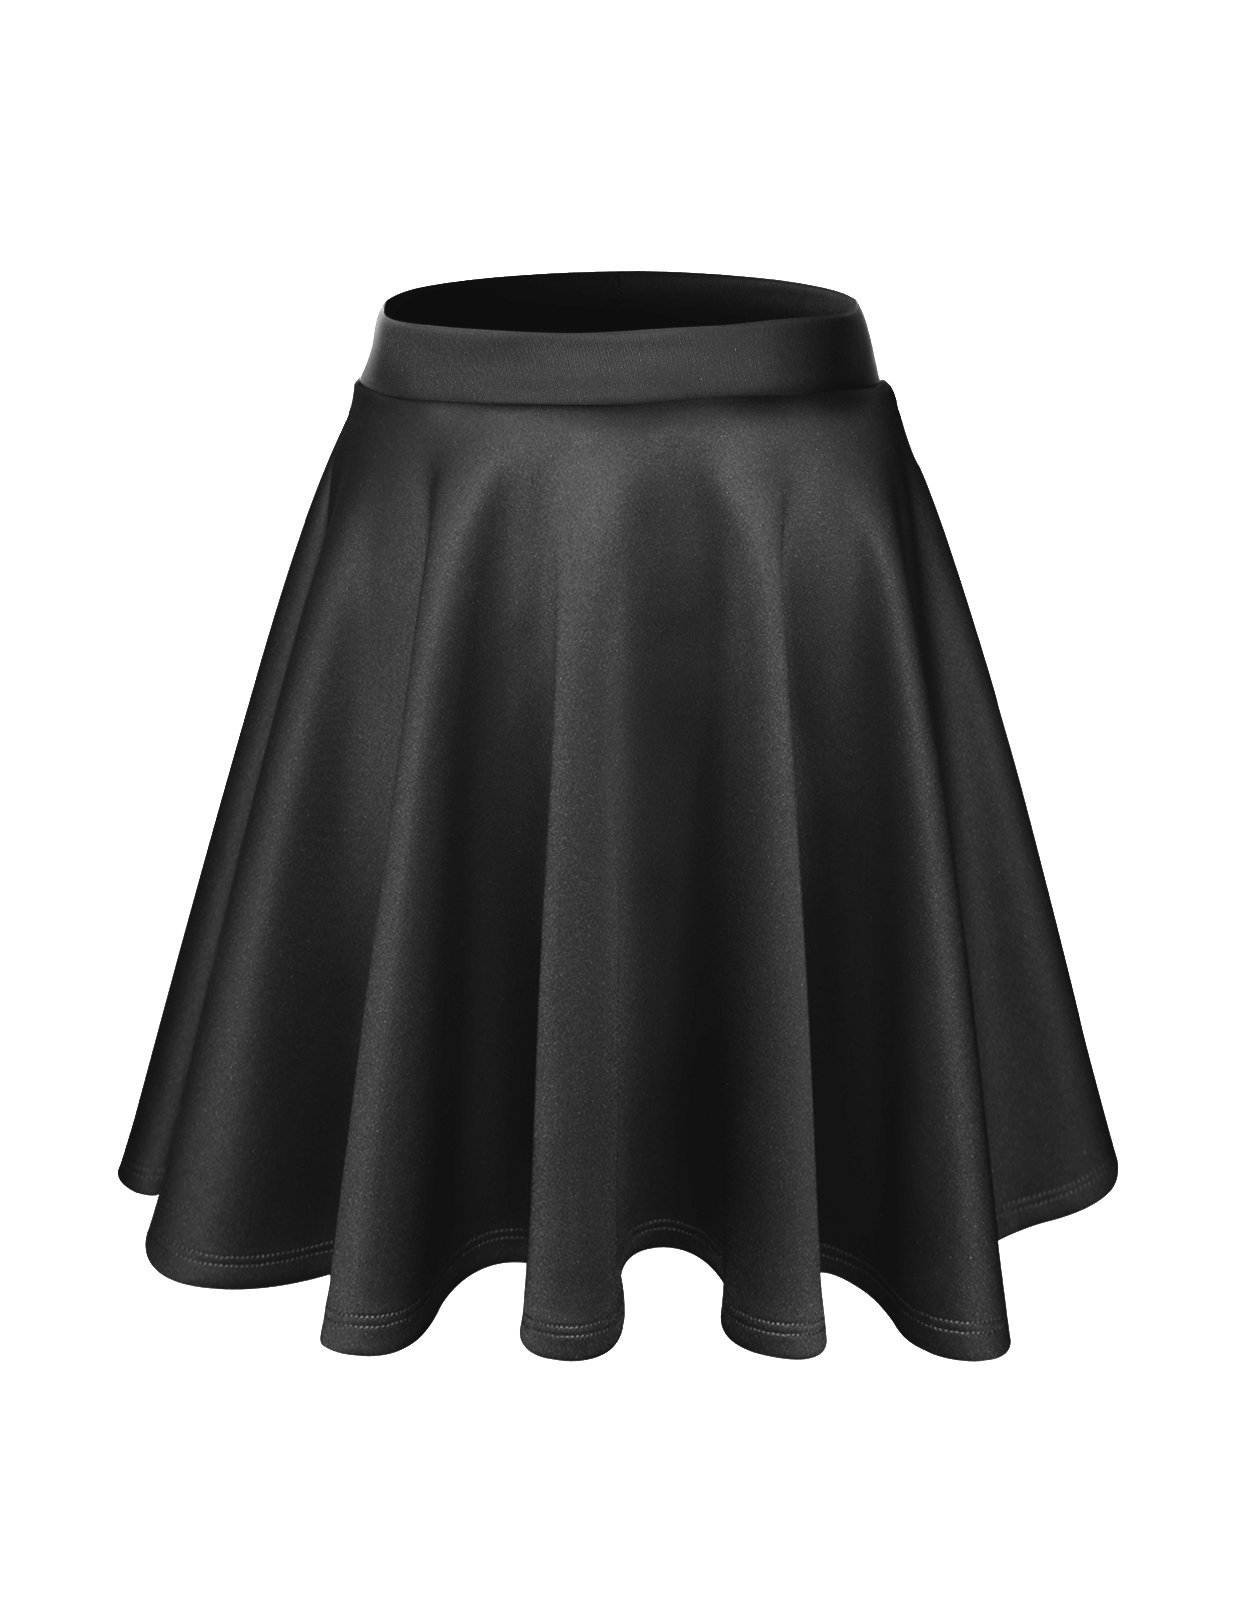 FLATSEVEN Womens Flared Skater Mini Skirt (Made in USA) (WSCX101) Charcoal, XL